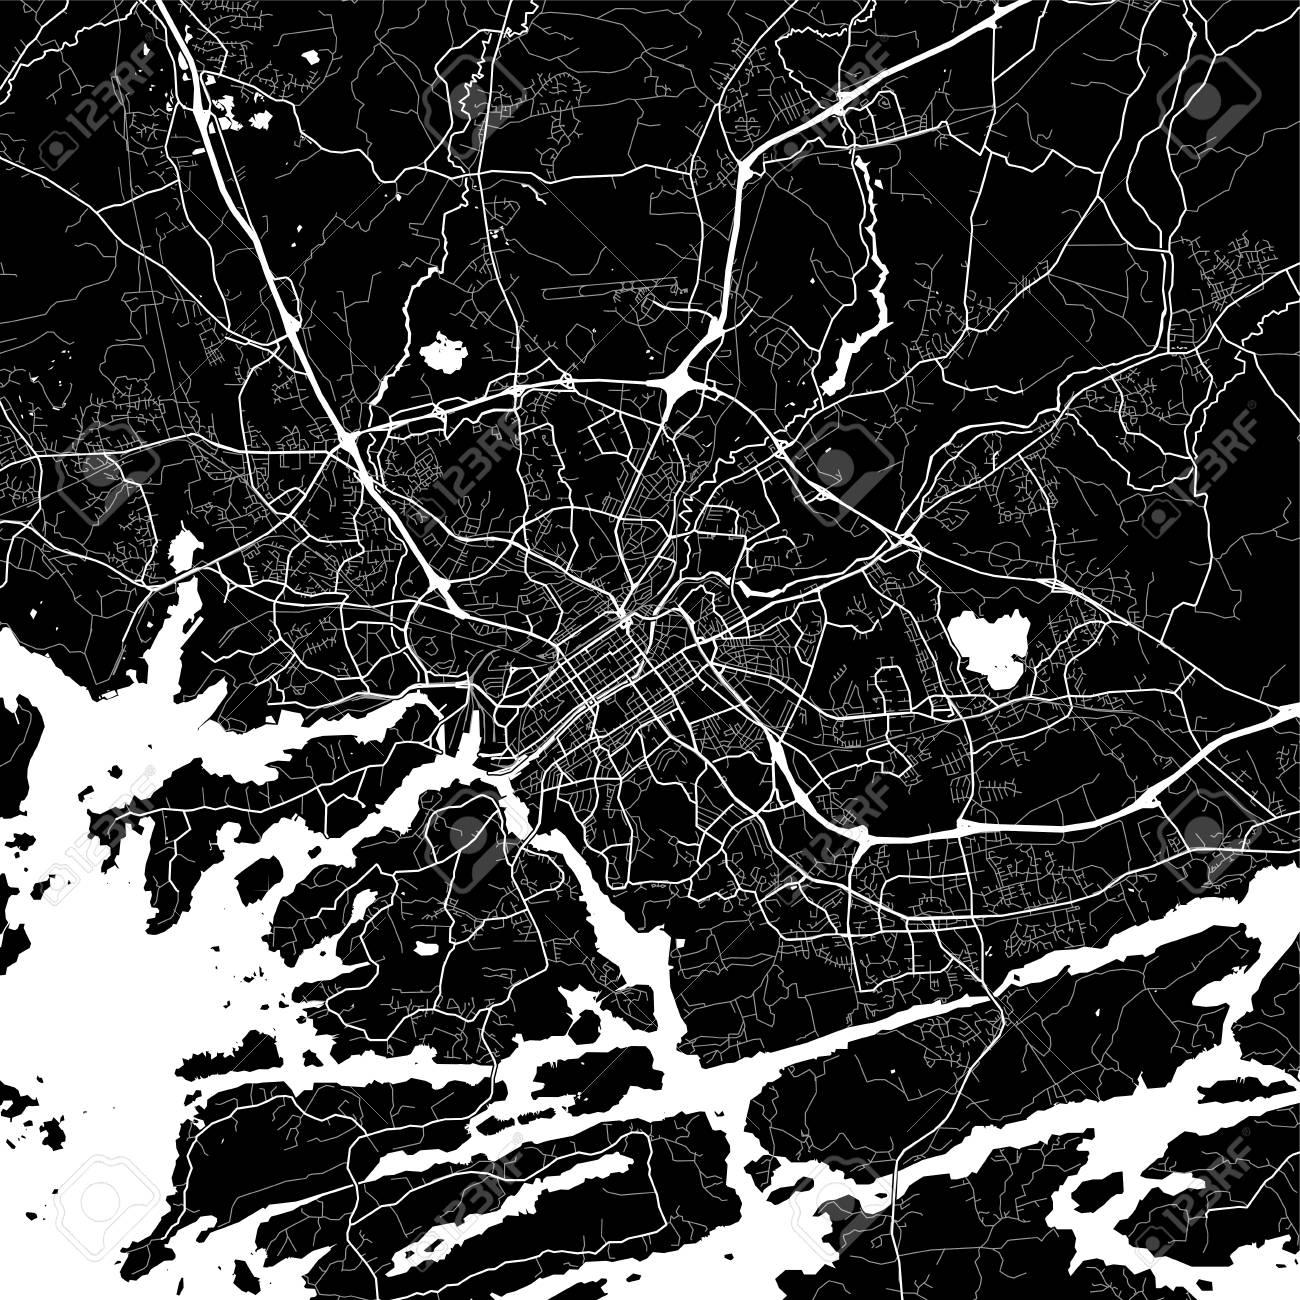 Turku map black and white